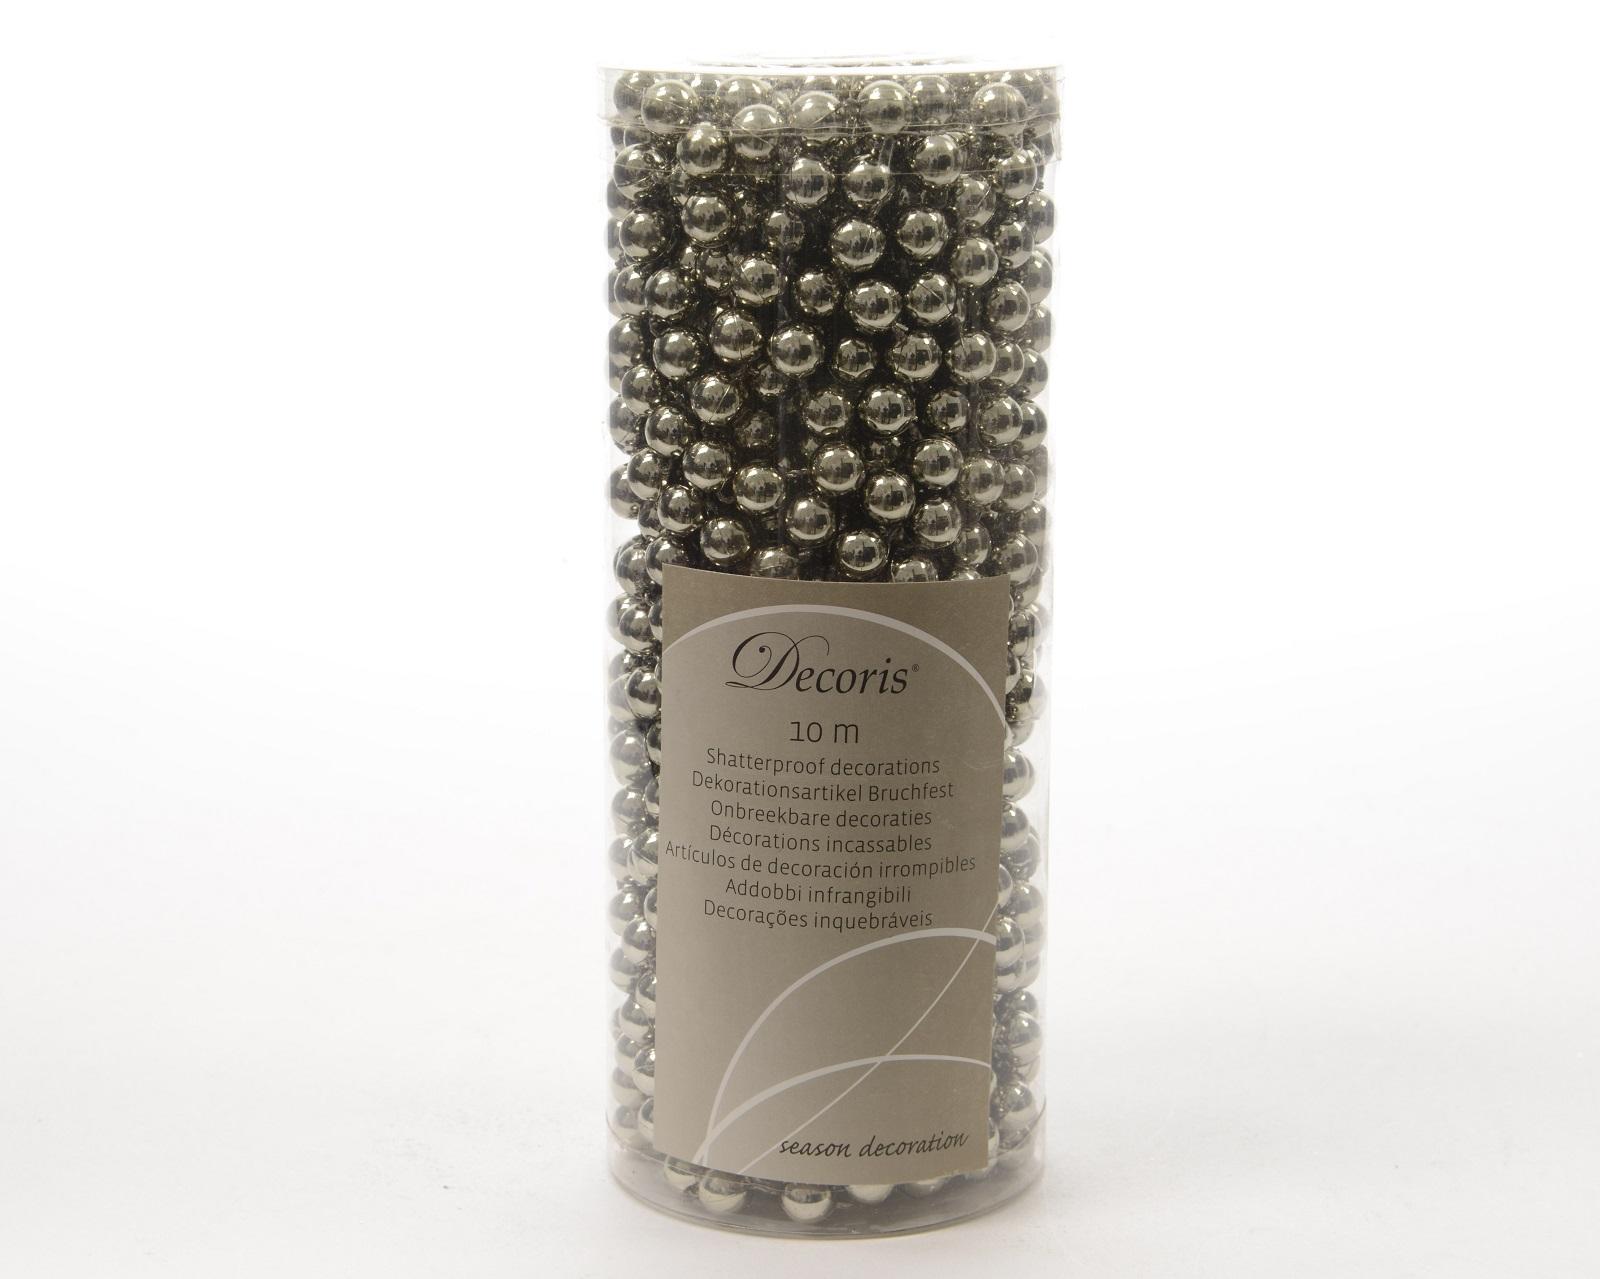 Perlenkette Kette Perlengirlande Baumschmuck Weihnachtsschmuck Deko lehm